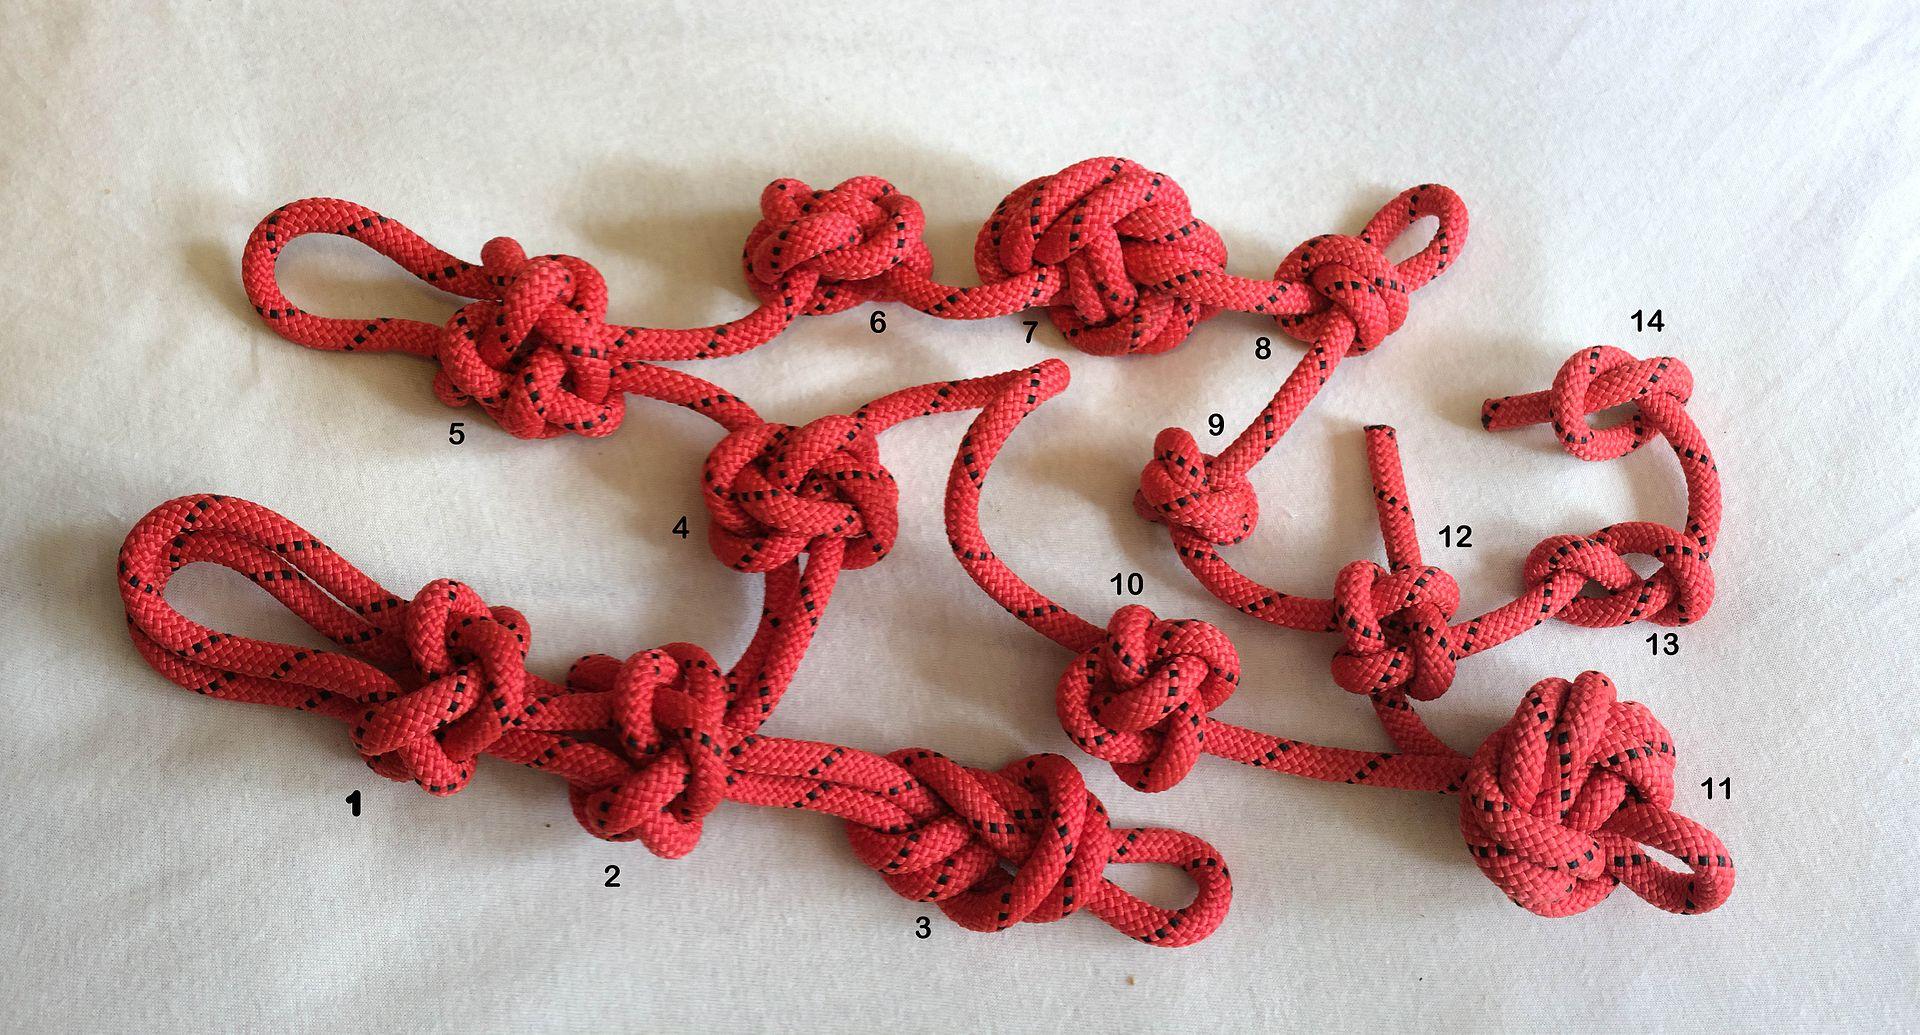 ashley book of knots pdf free